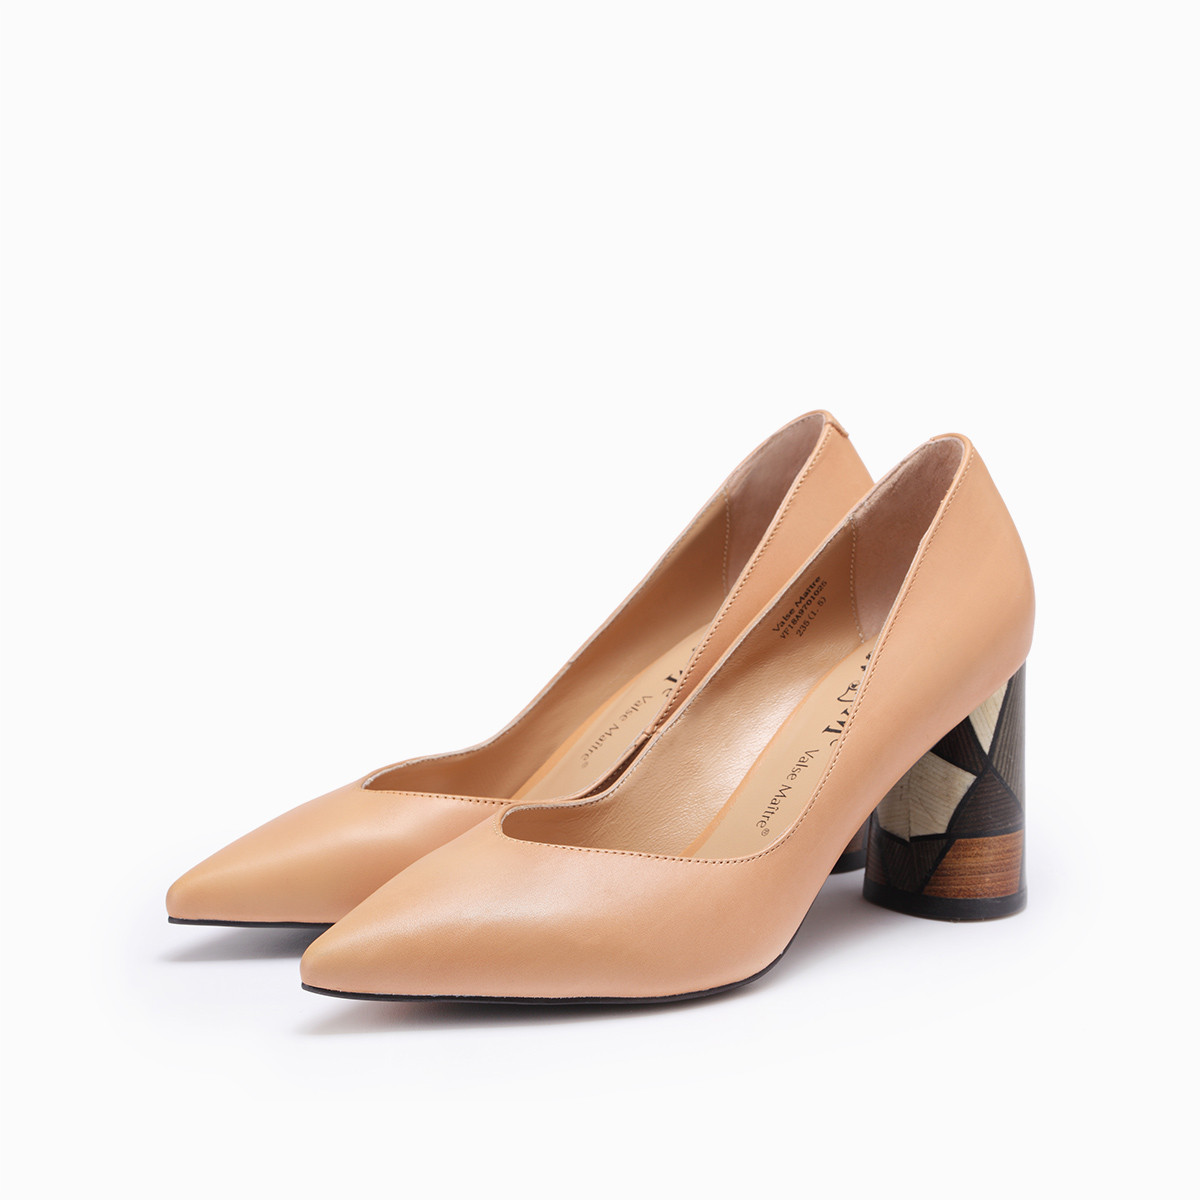 VMe春季时尚尖头图形拼色鞋跟粗高跟浅口单鞋VF18A9701025